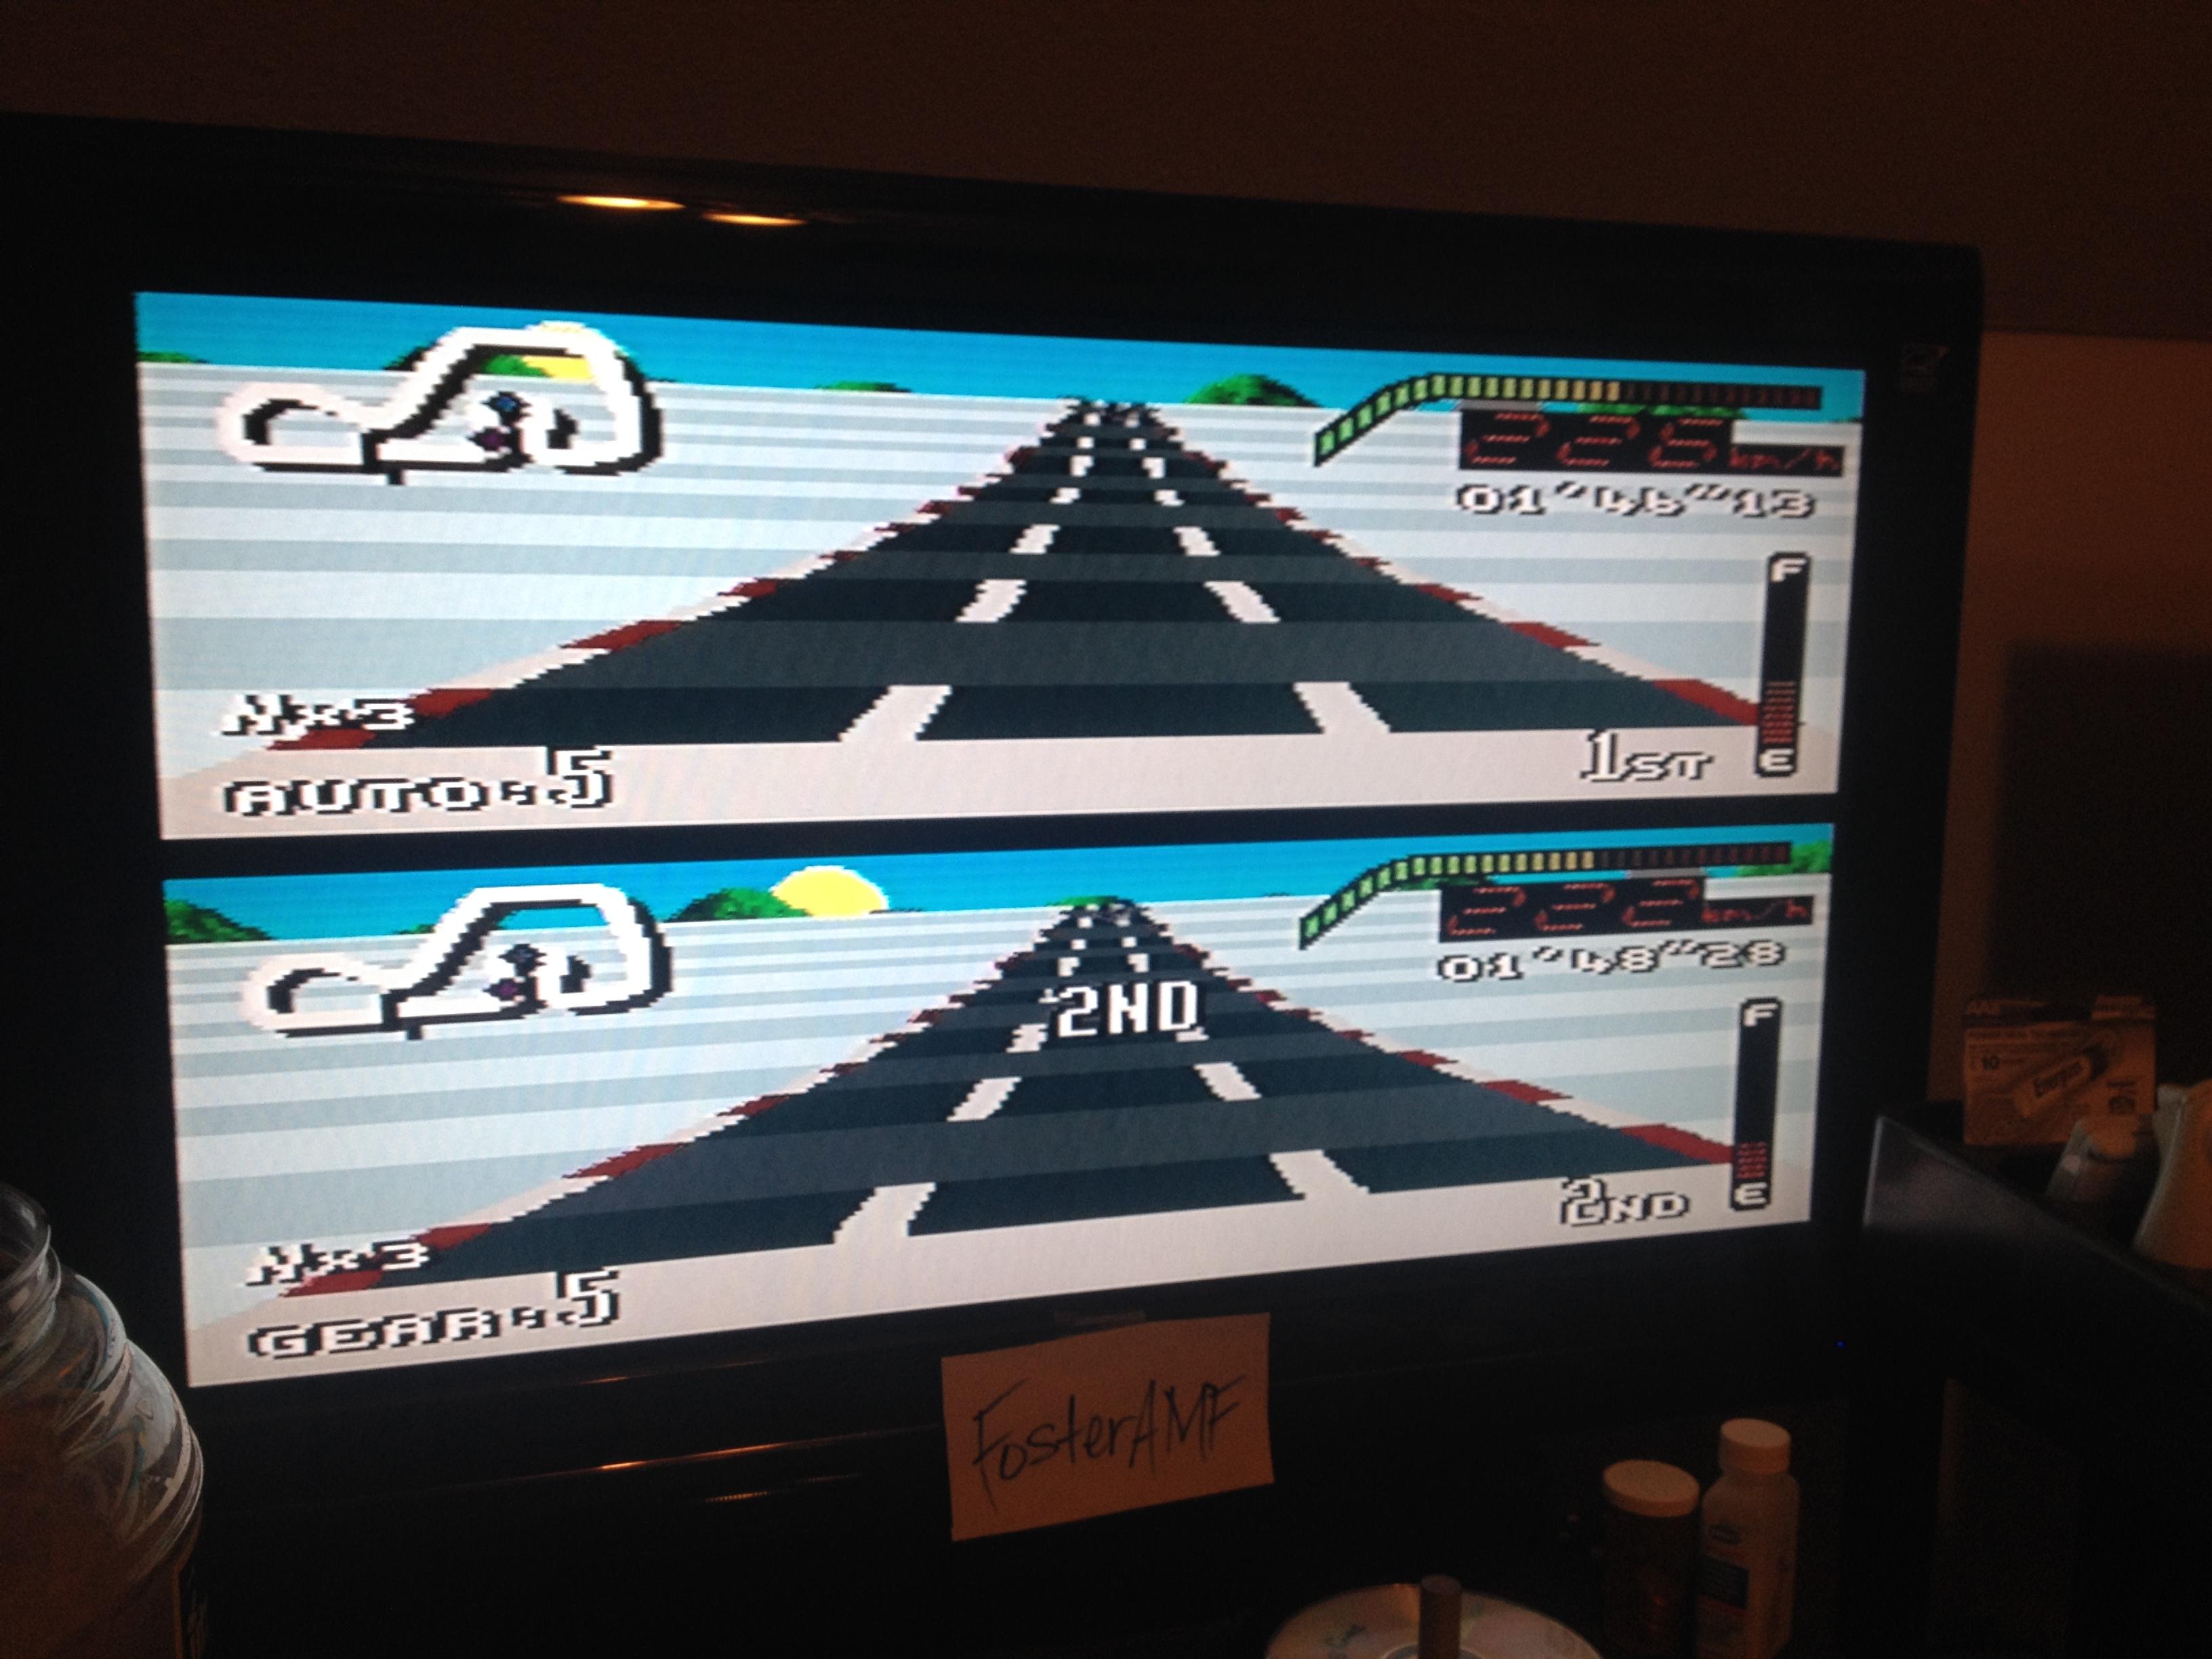 FosterAMF: Top Gear [Track 19: Helsinki/Amateur Difficulty/No Nitro] (SNES/Super Famicom) 0:01:46.13 points on 2014-07-30 00:32:26